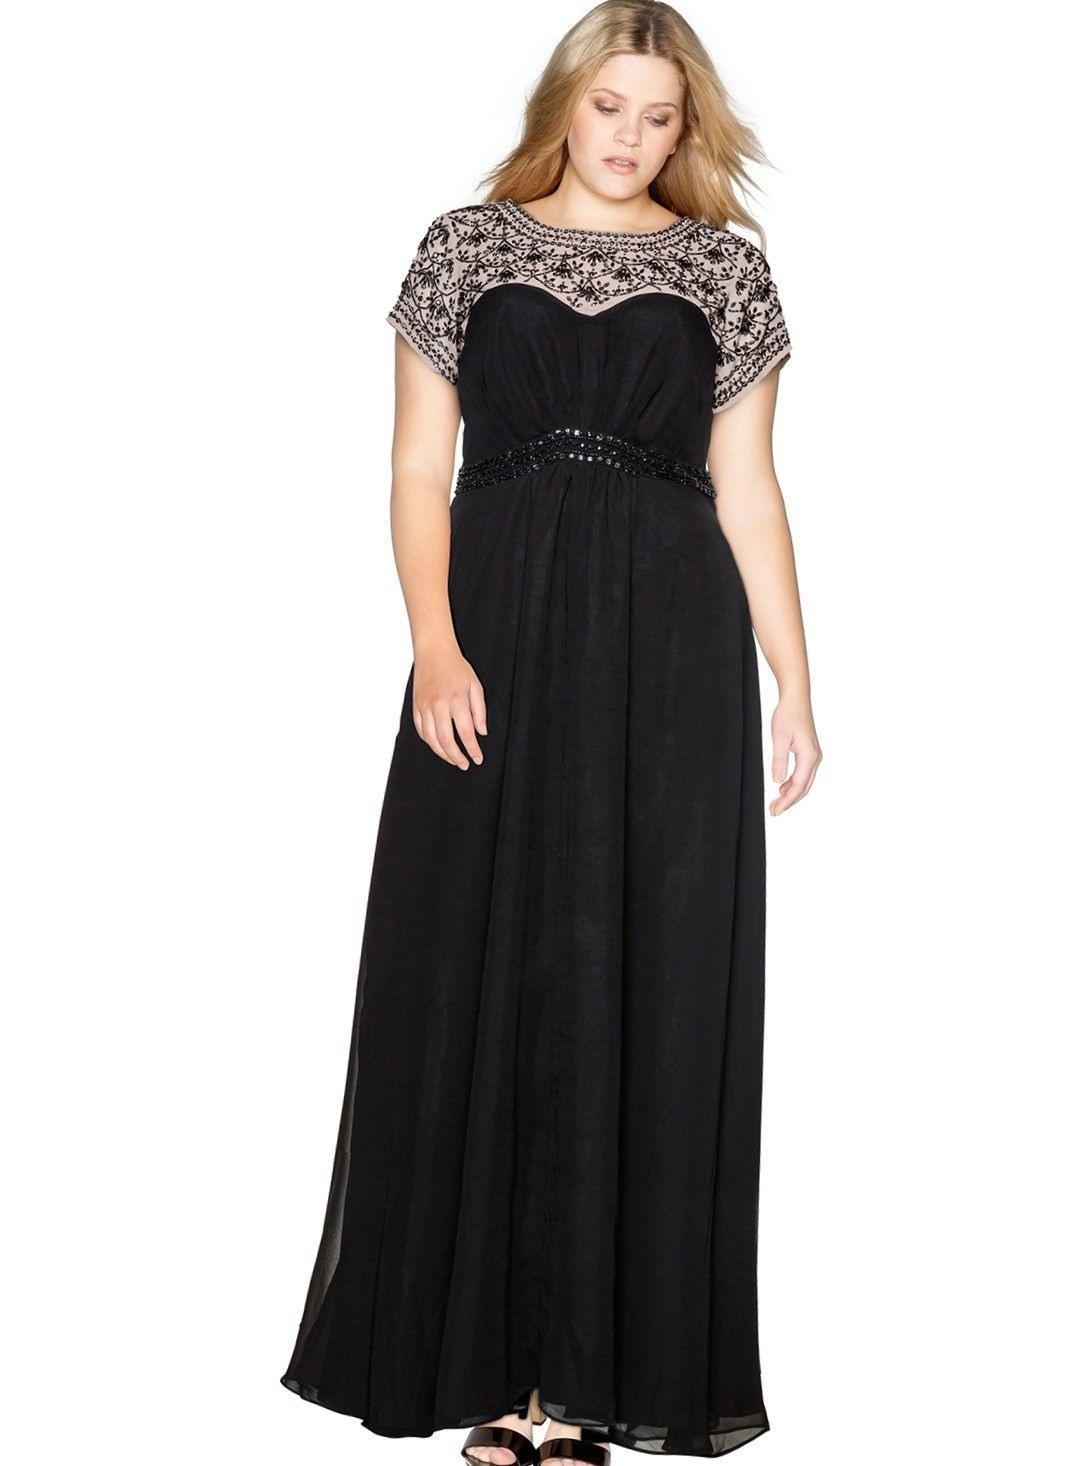 10 Elegant Abendkleid Im Lagenlook Boutique10 Luxus Abendkleid Im Lagenlook Vertrieb